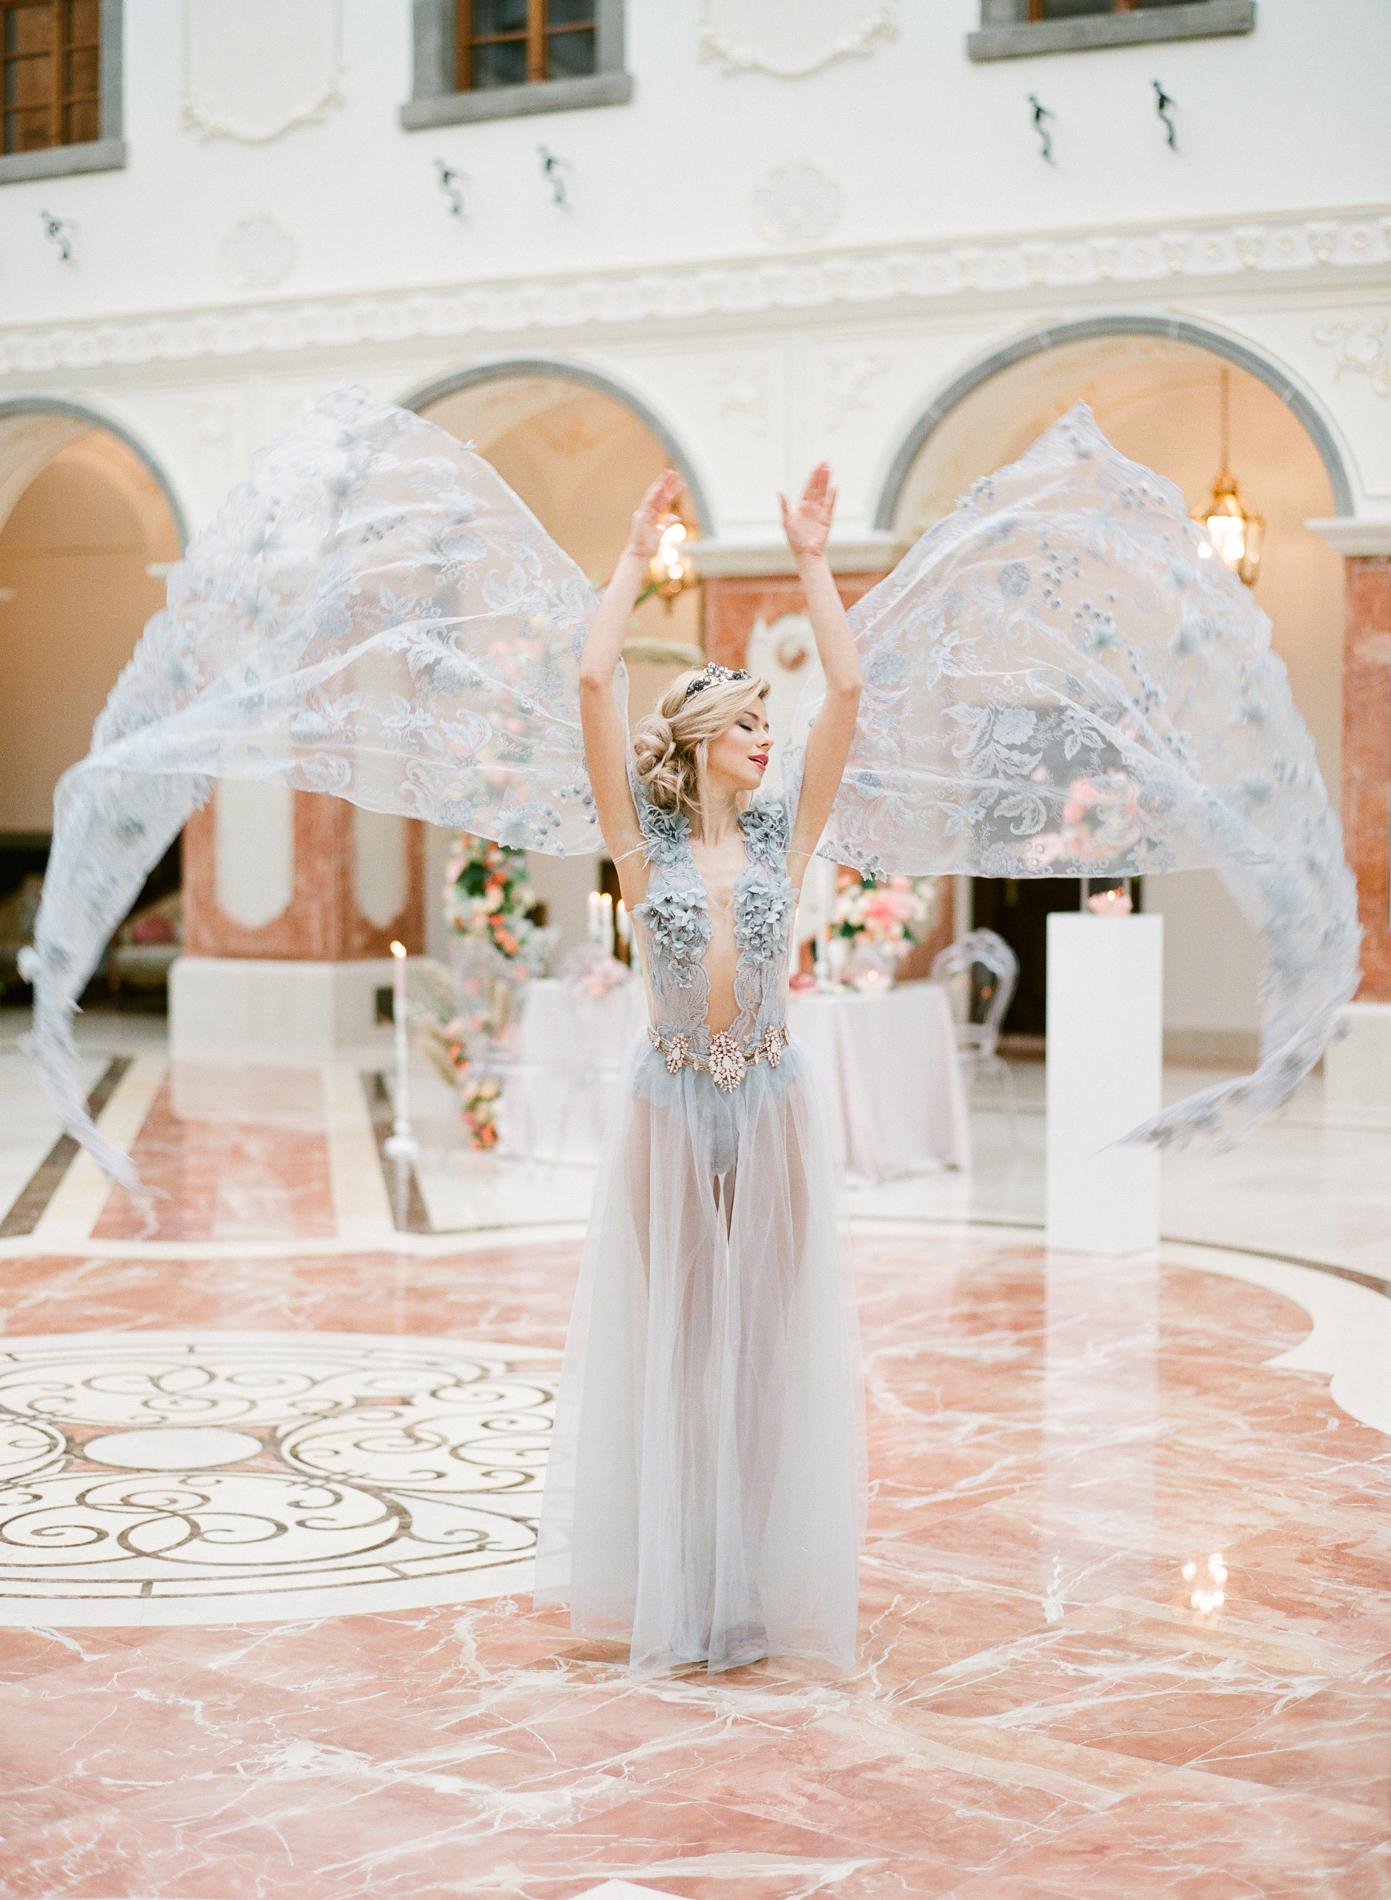 galicia_nueva_wedding_photographer_nikol_bodnarova_italy_wedding_photographer_92.JPG